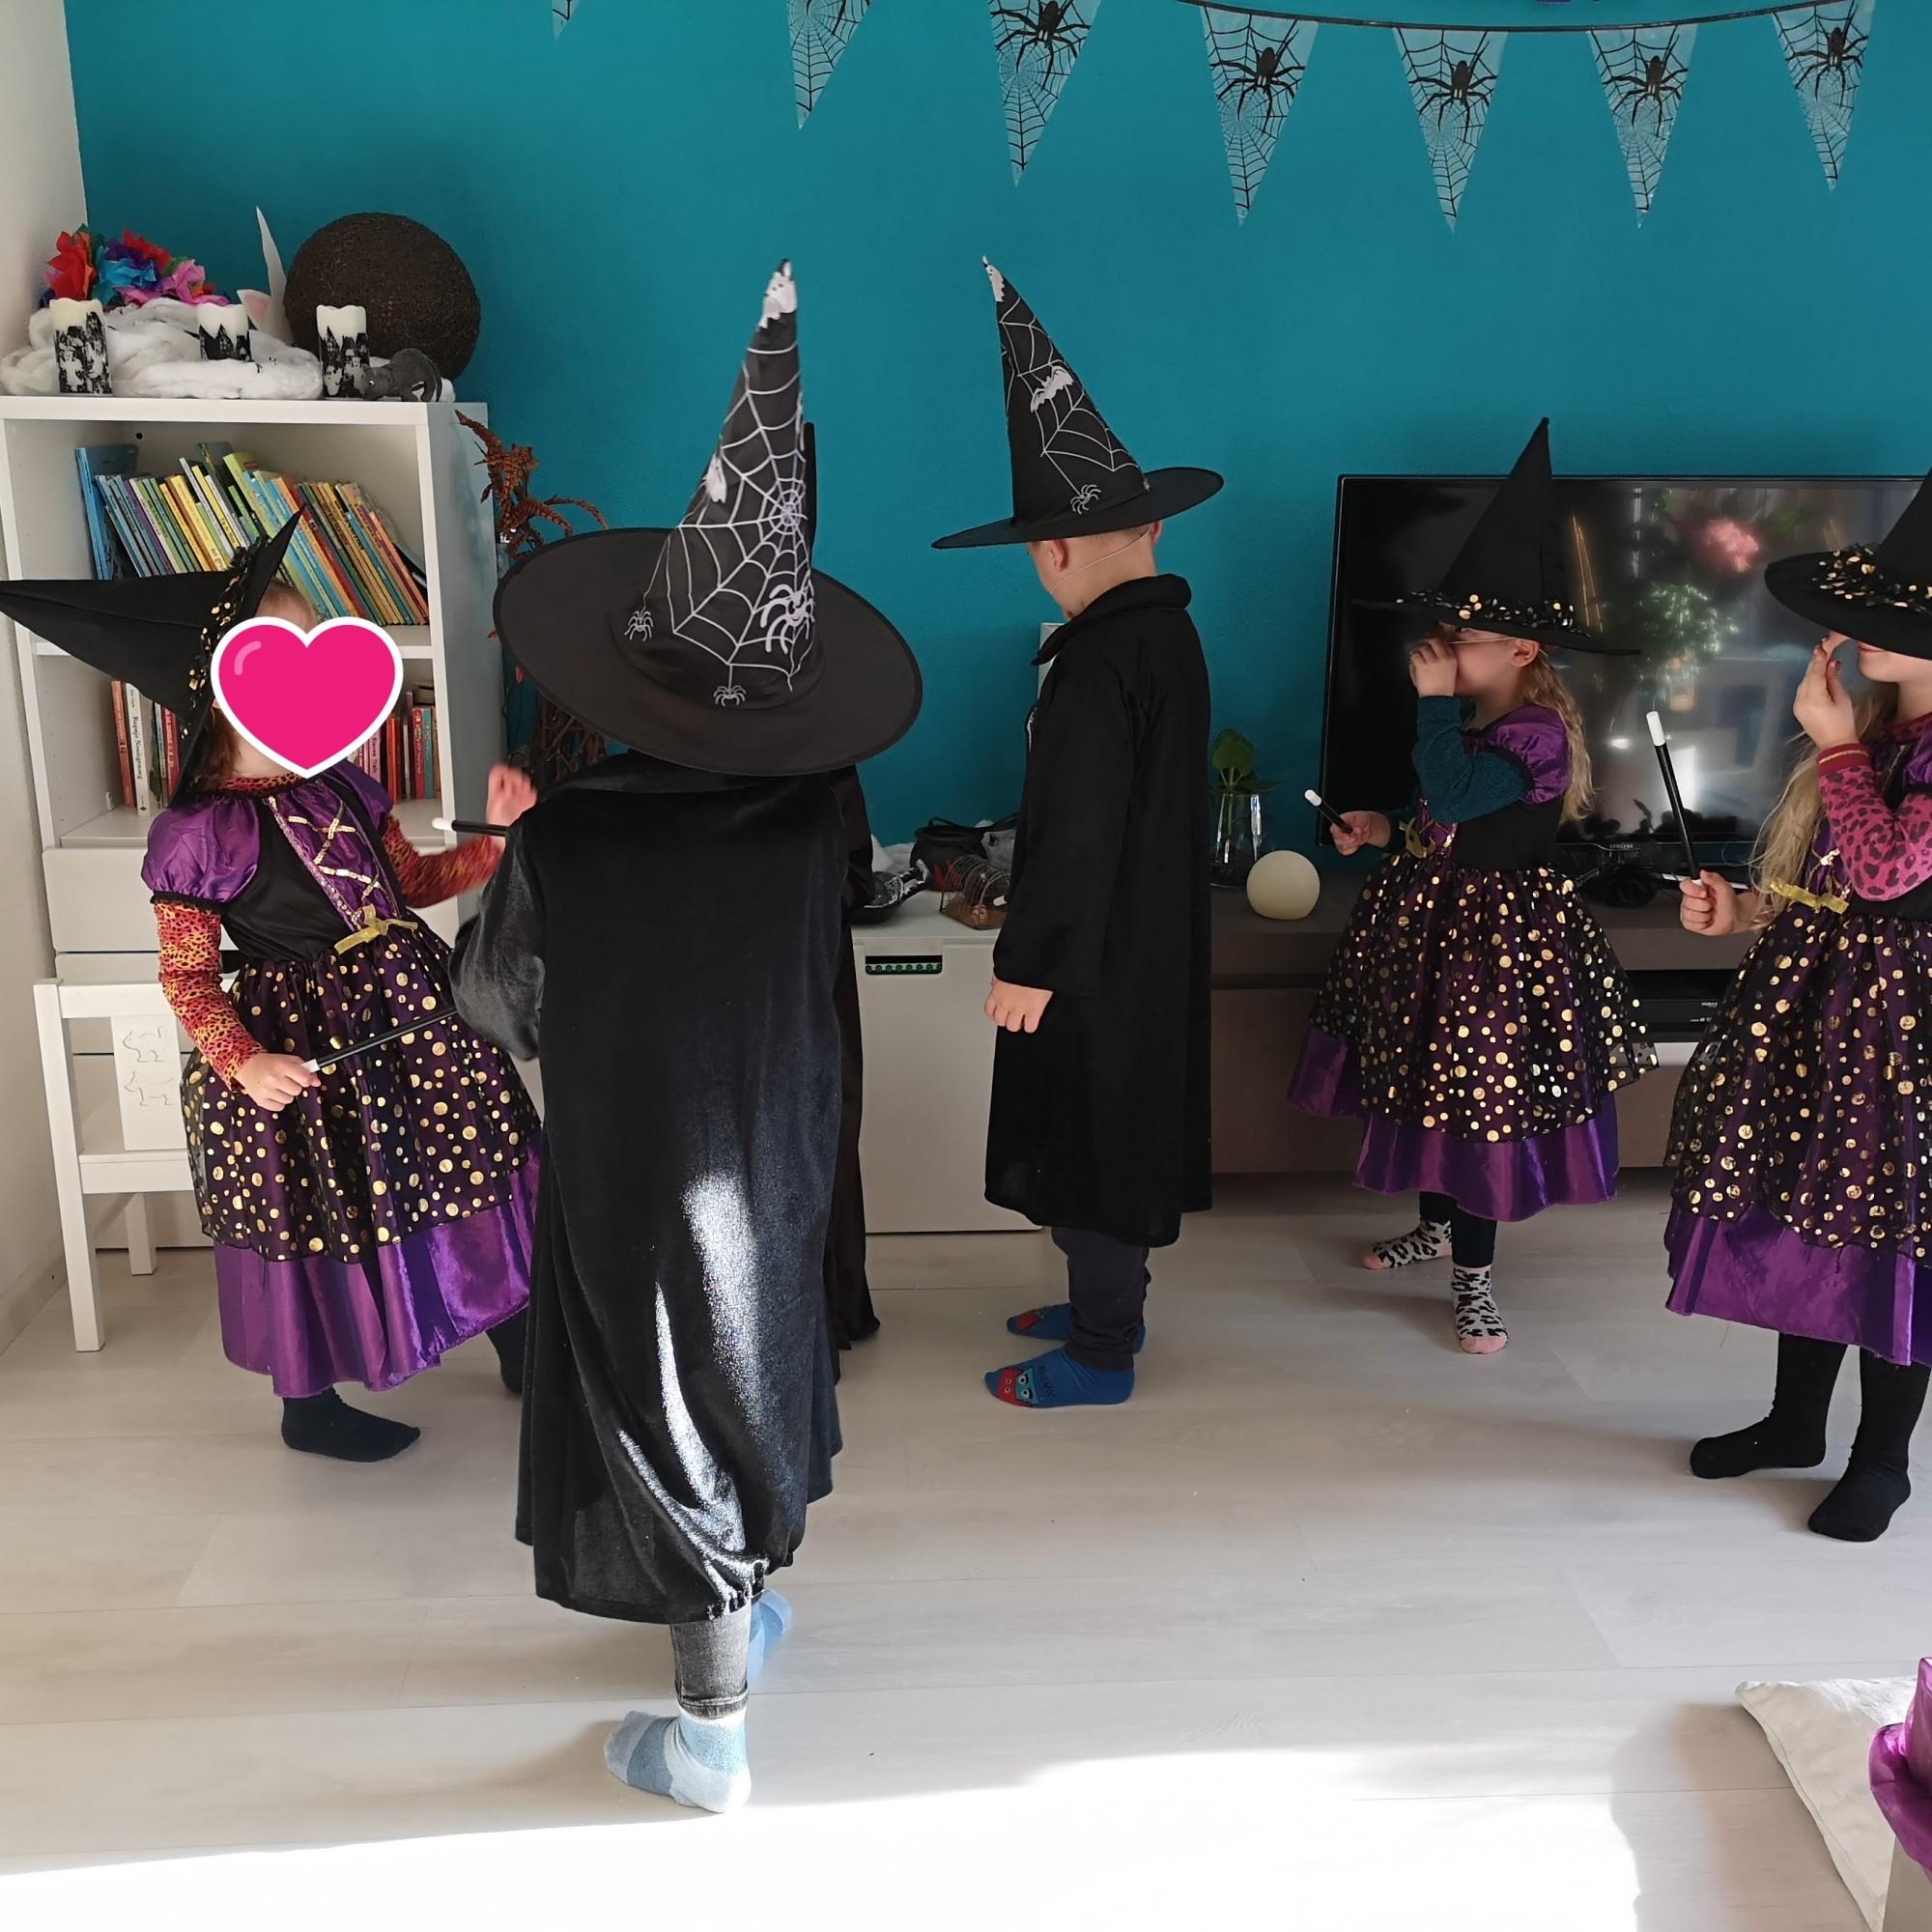 Heksenfeest